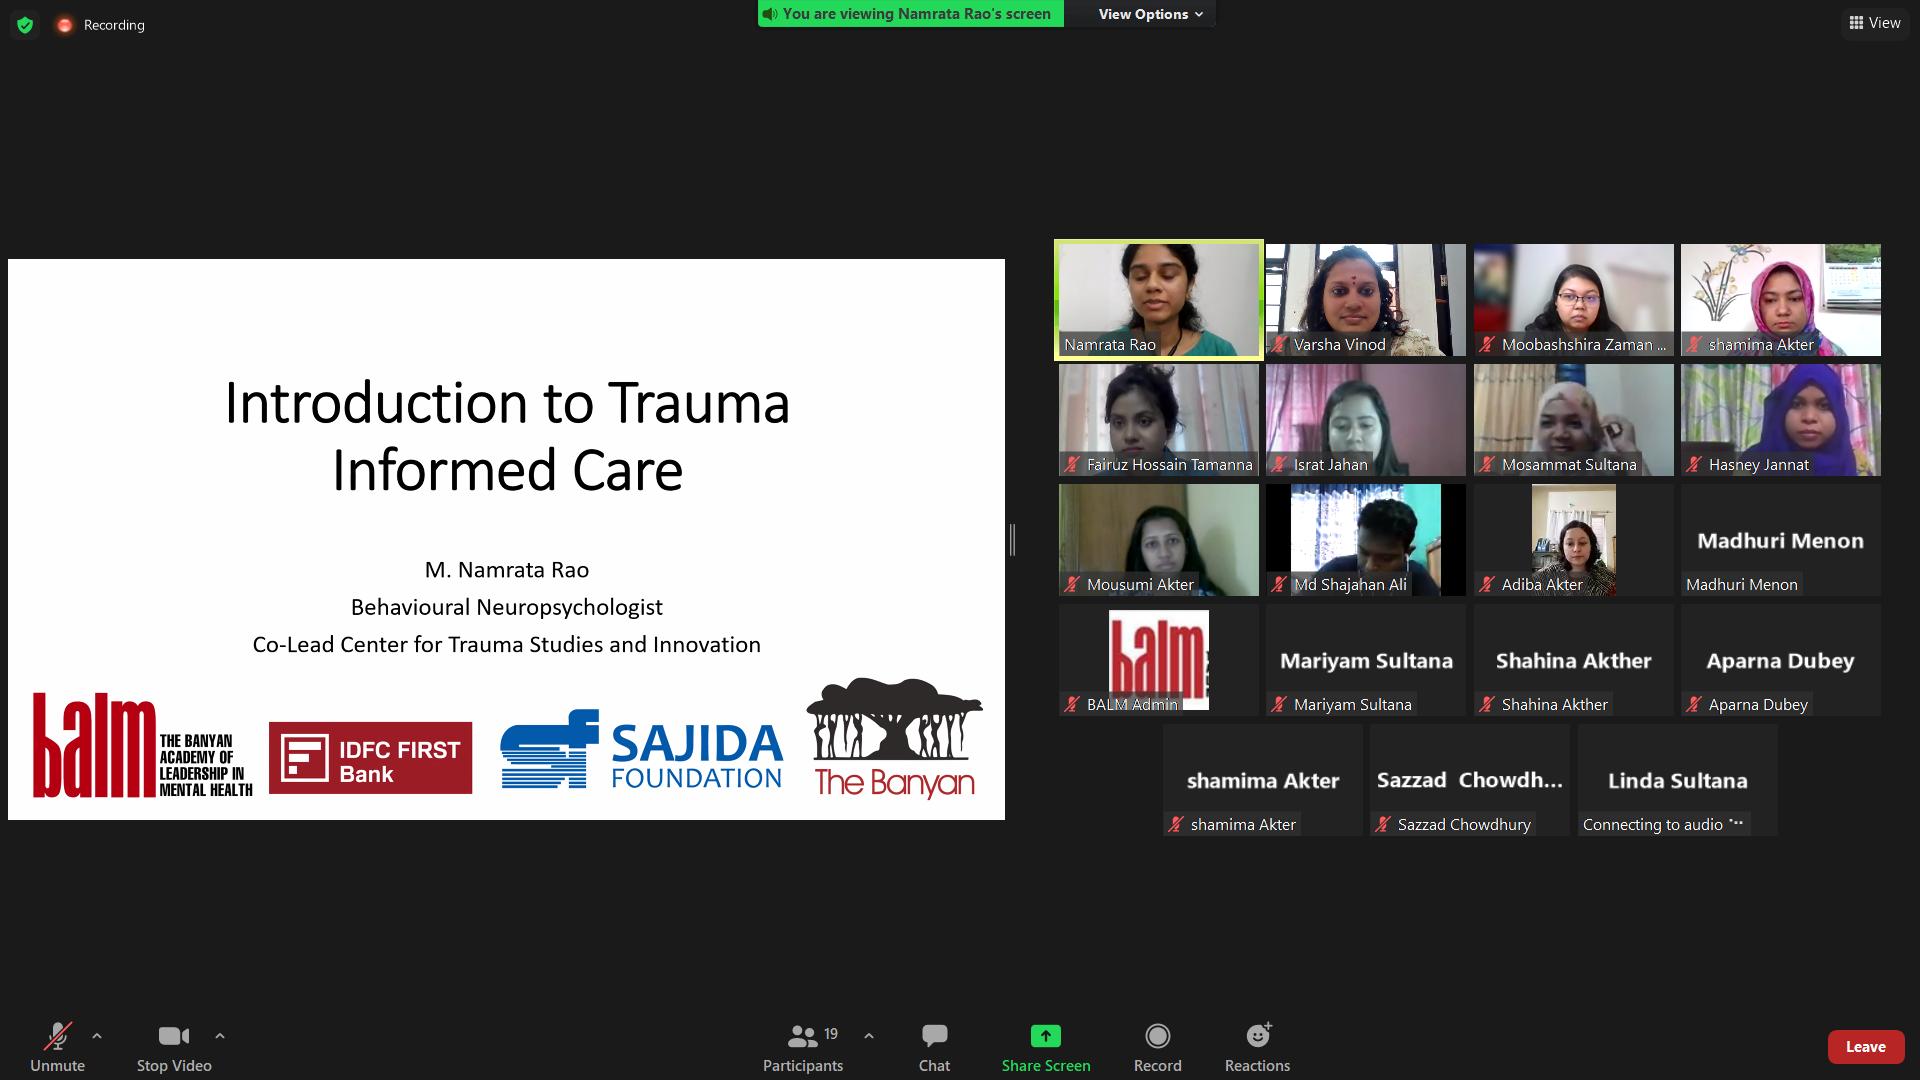 Community Mental Health with SAJIDAFoundation, Bangladesh